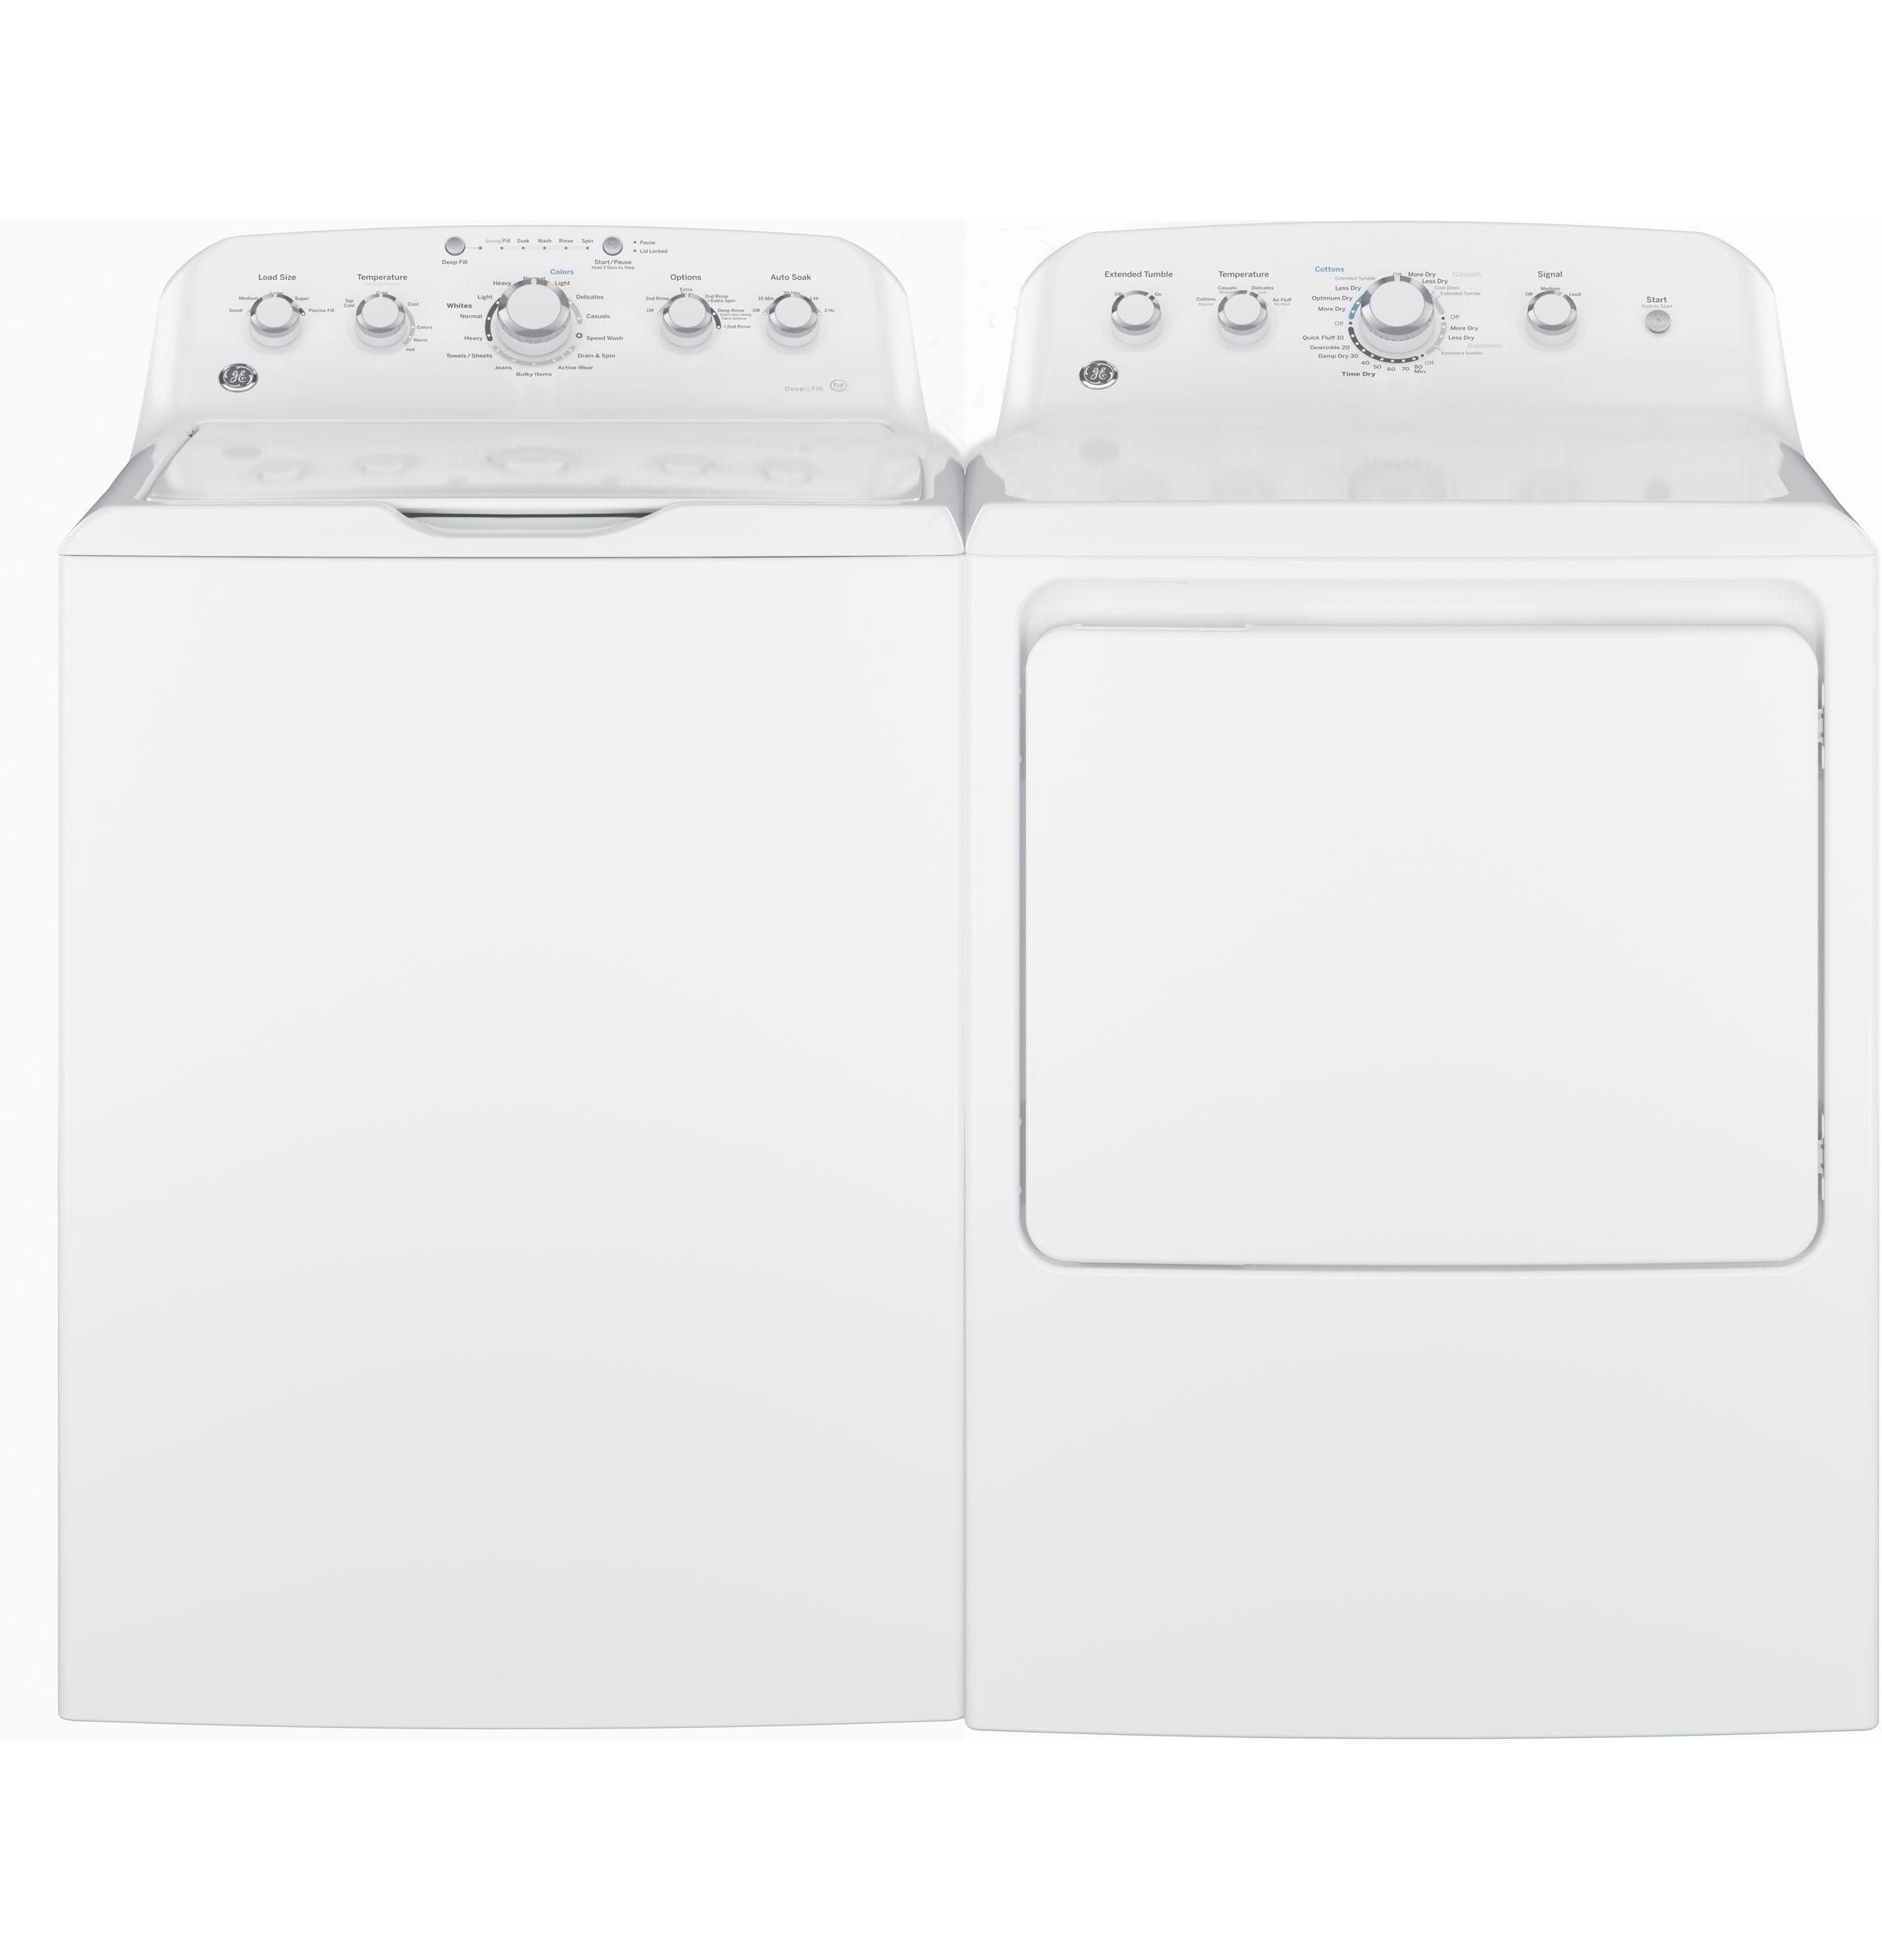 Model: GTD42GASJWW   GE GE® 7.2 cu. ft. Capacity aluminized alloy drum Gas Dryer